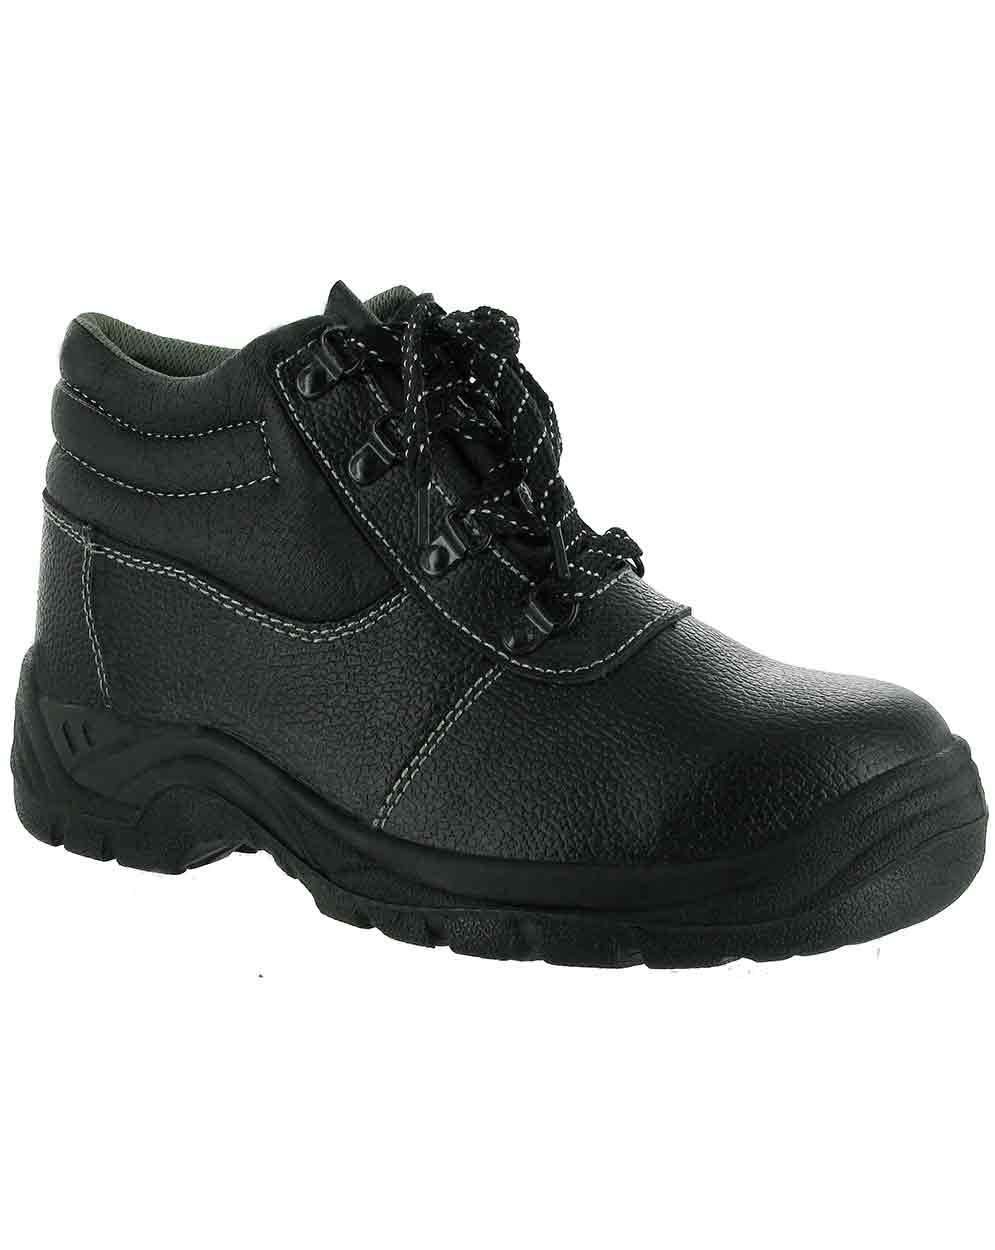 1519fcdce6b Centek FS330 S1-P Safety Chukka Boot - Standard Safety Boots - Mens ...